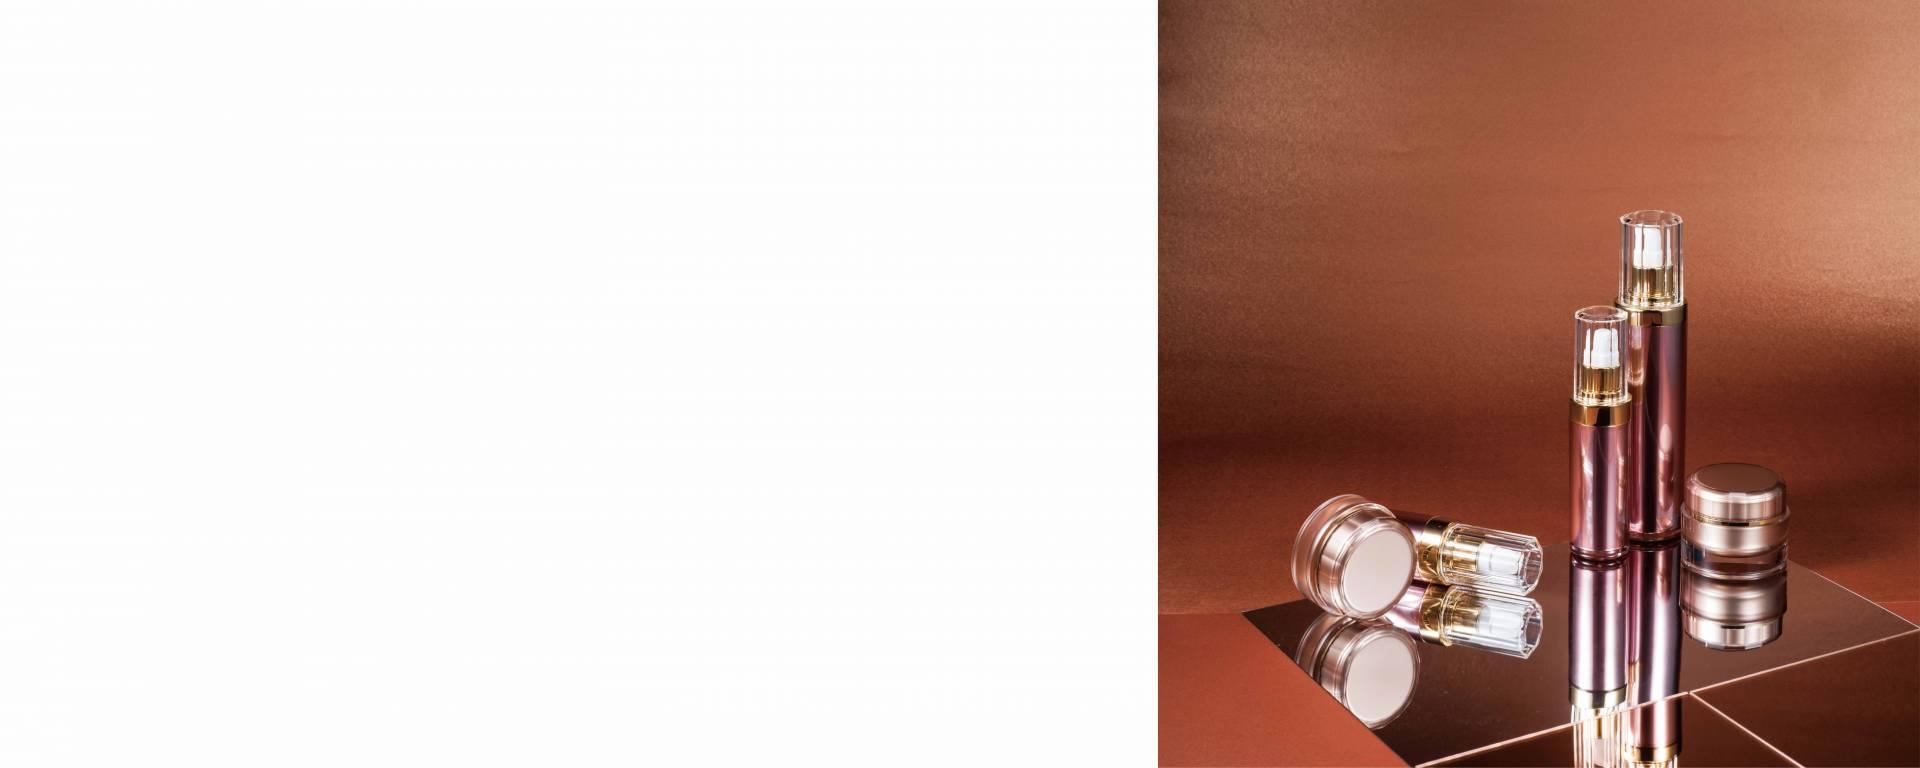 COSJAR 護膚化妝品包裝器材  時尚,典雅,高級透明水晶壓克力包裝